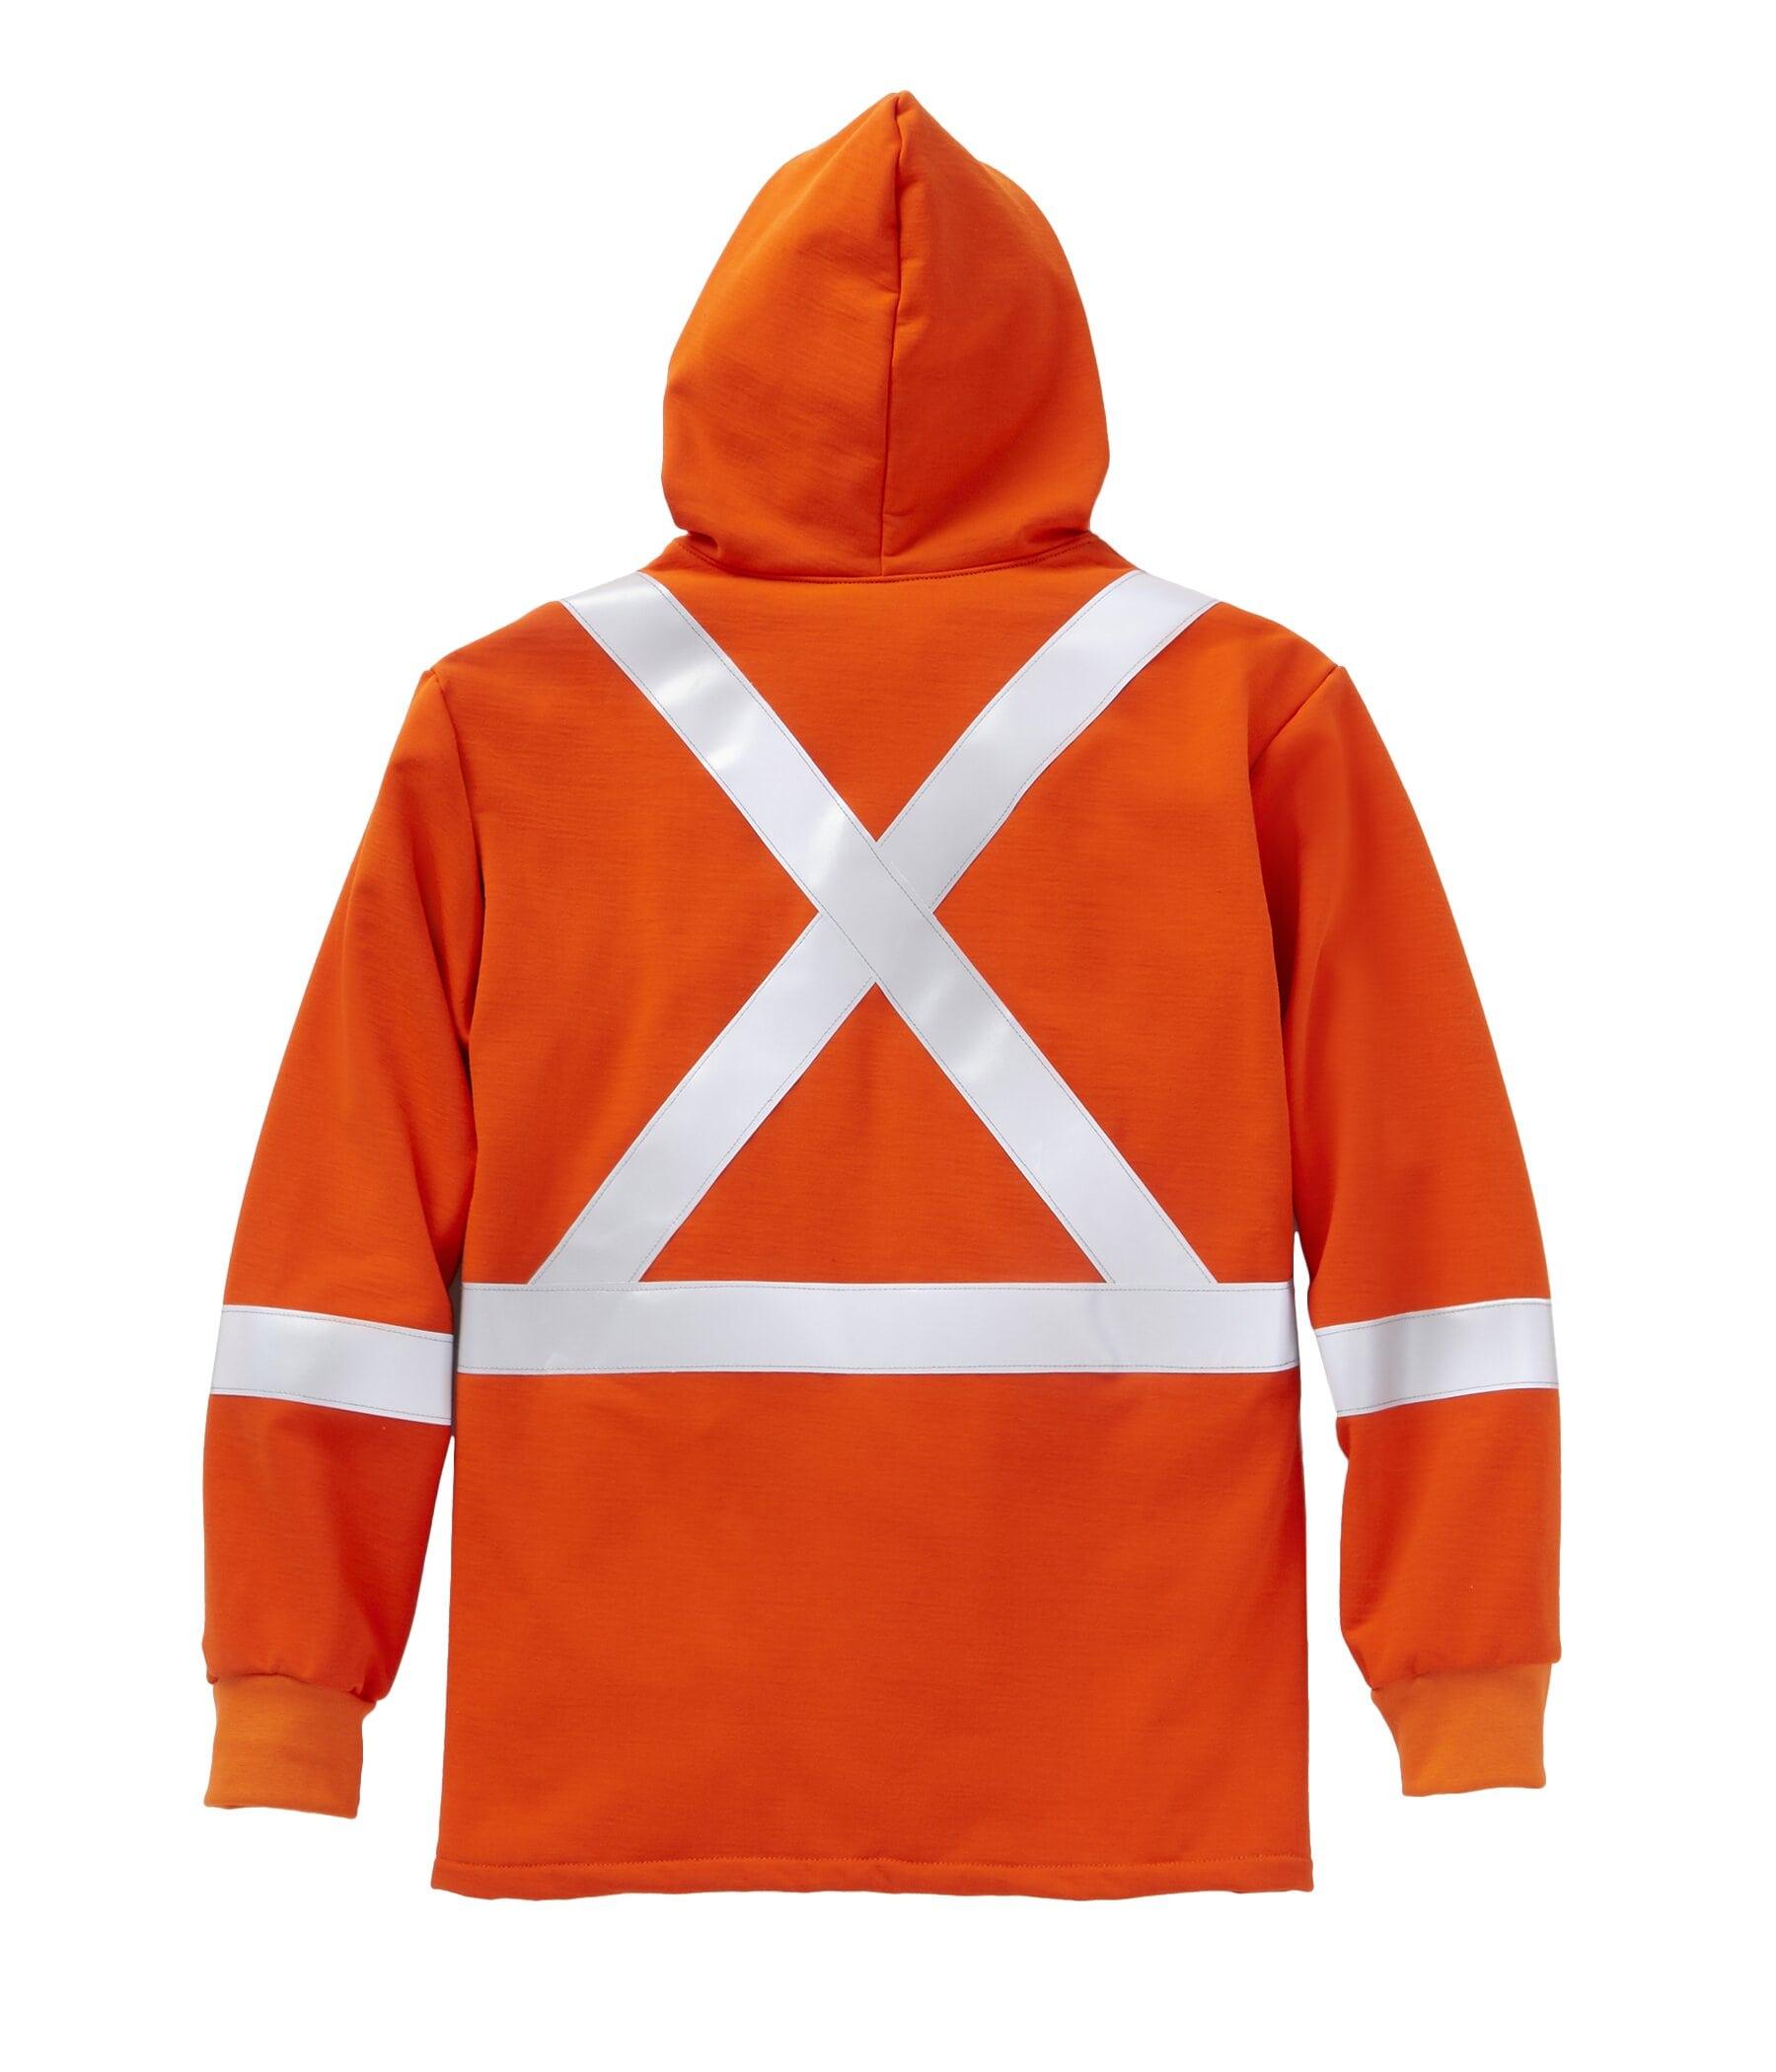 FR Inherent Pullover Hoodie